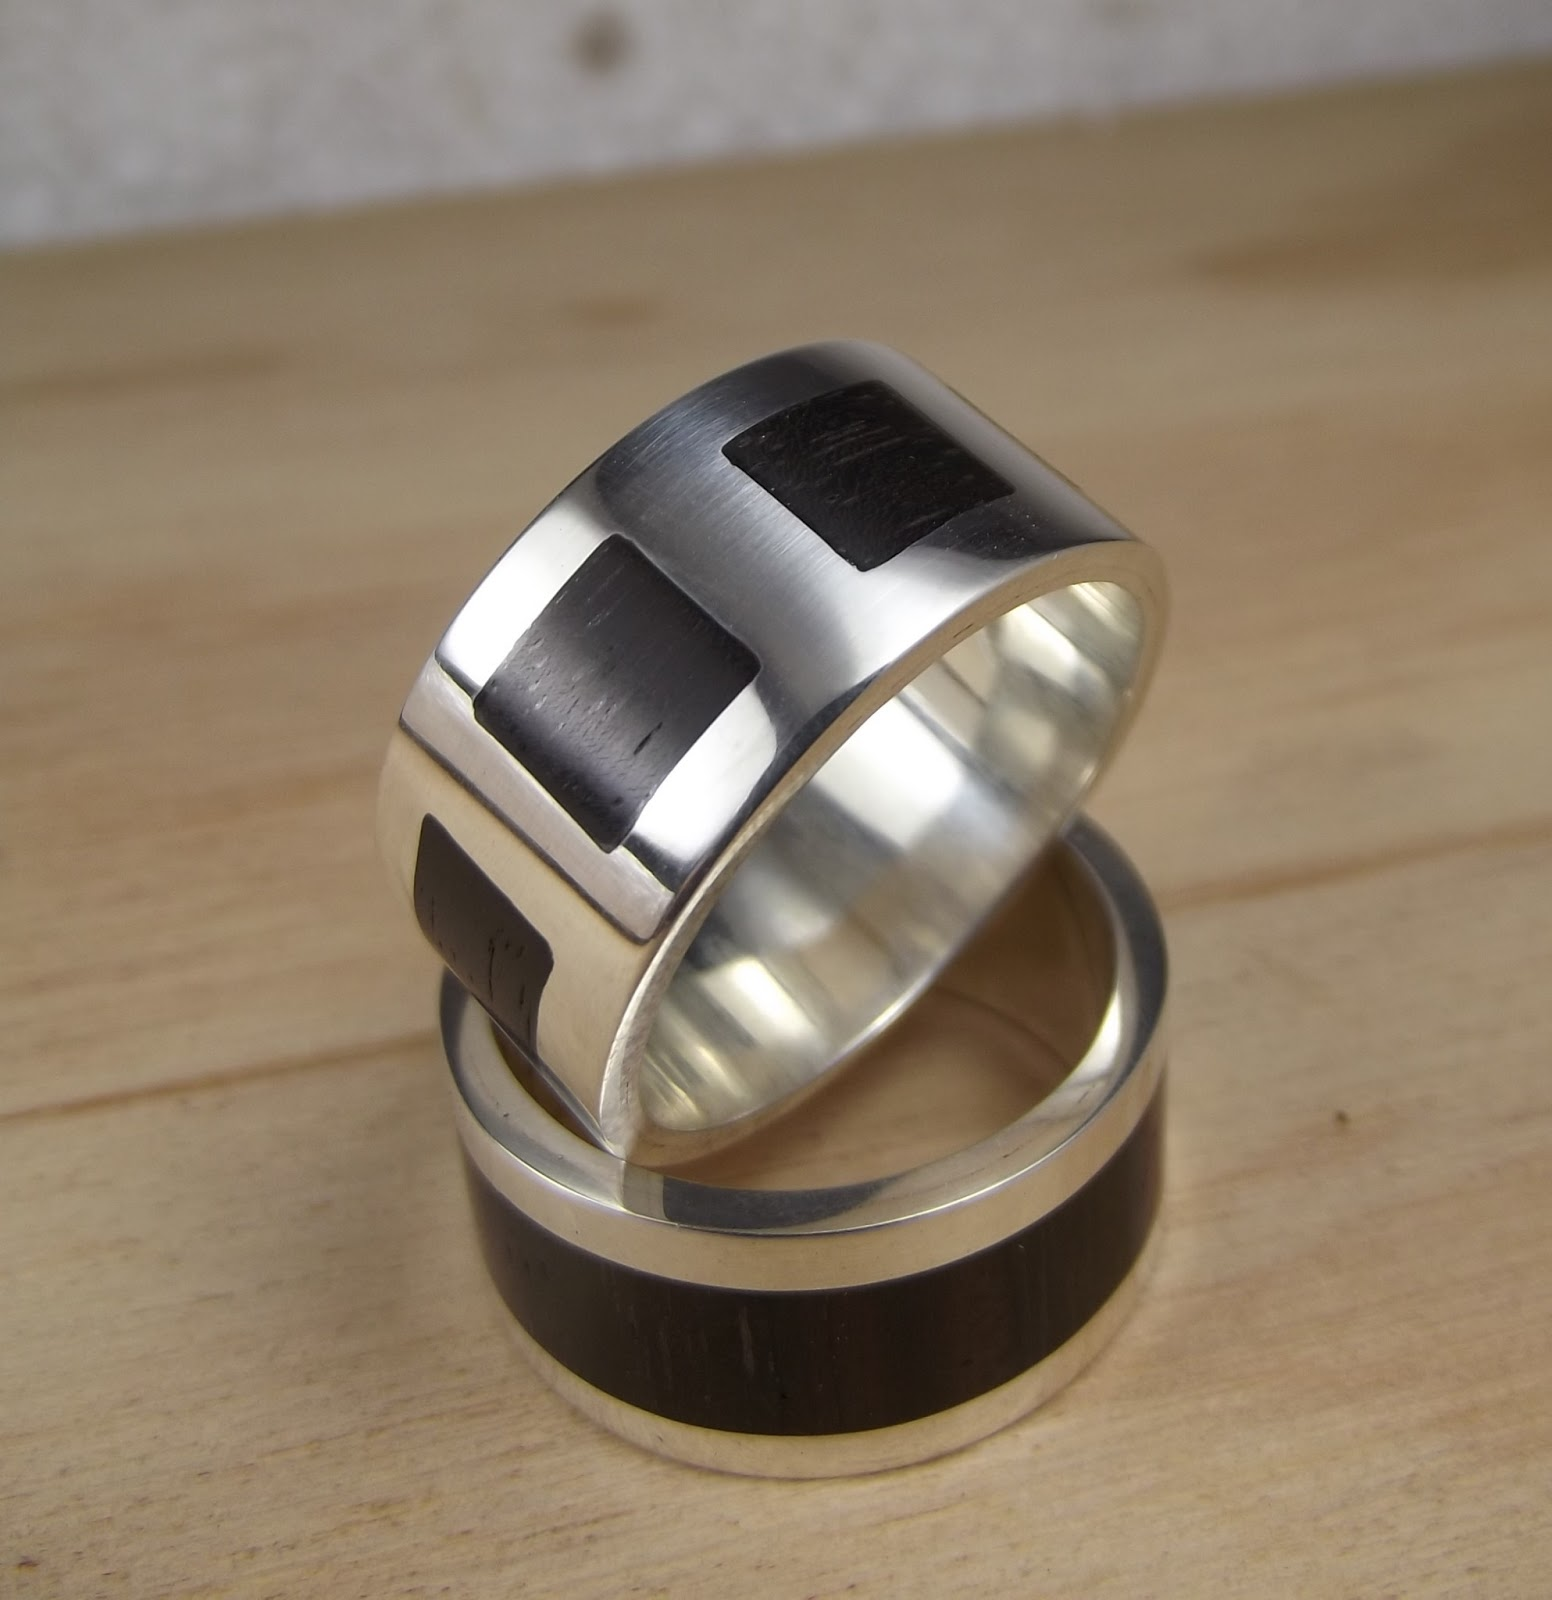 imagenes de anillos de plata para matrimonio - Imagenes De Anillos | Amazon Anillos Joyería